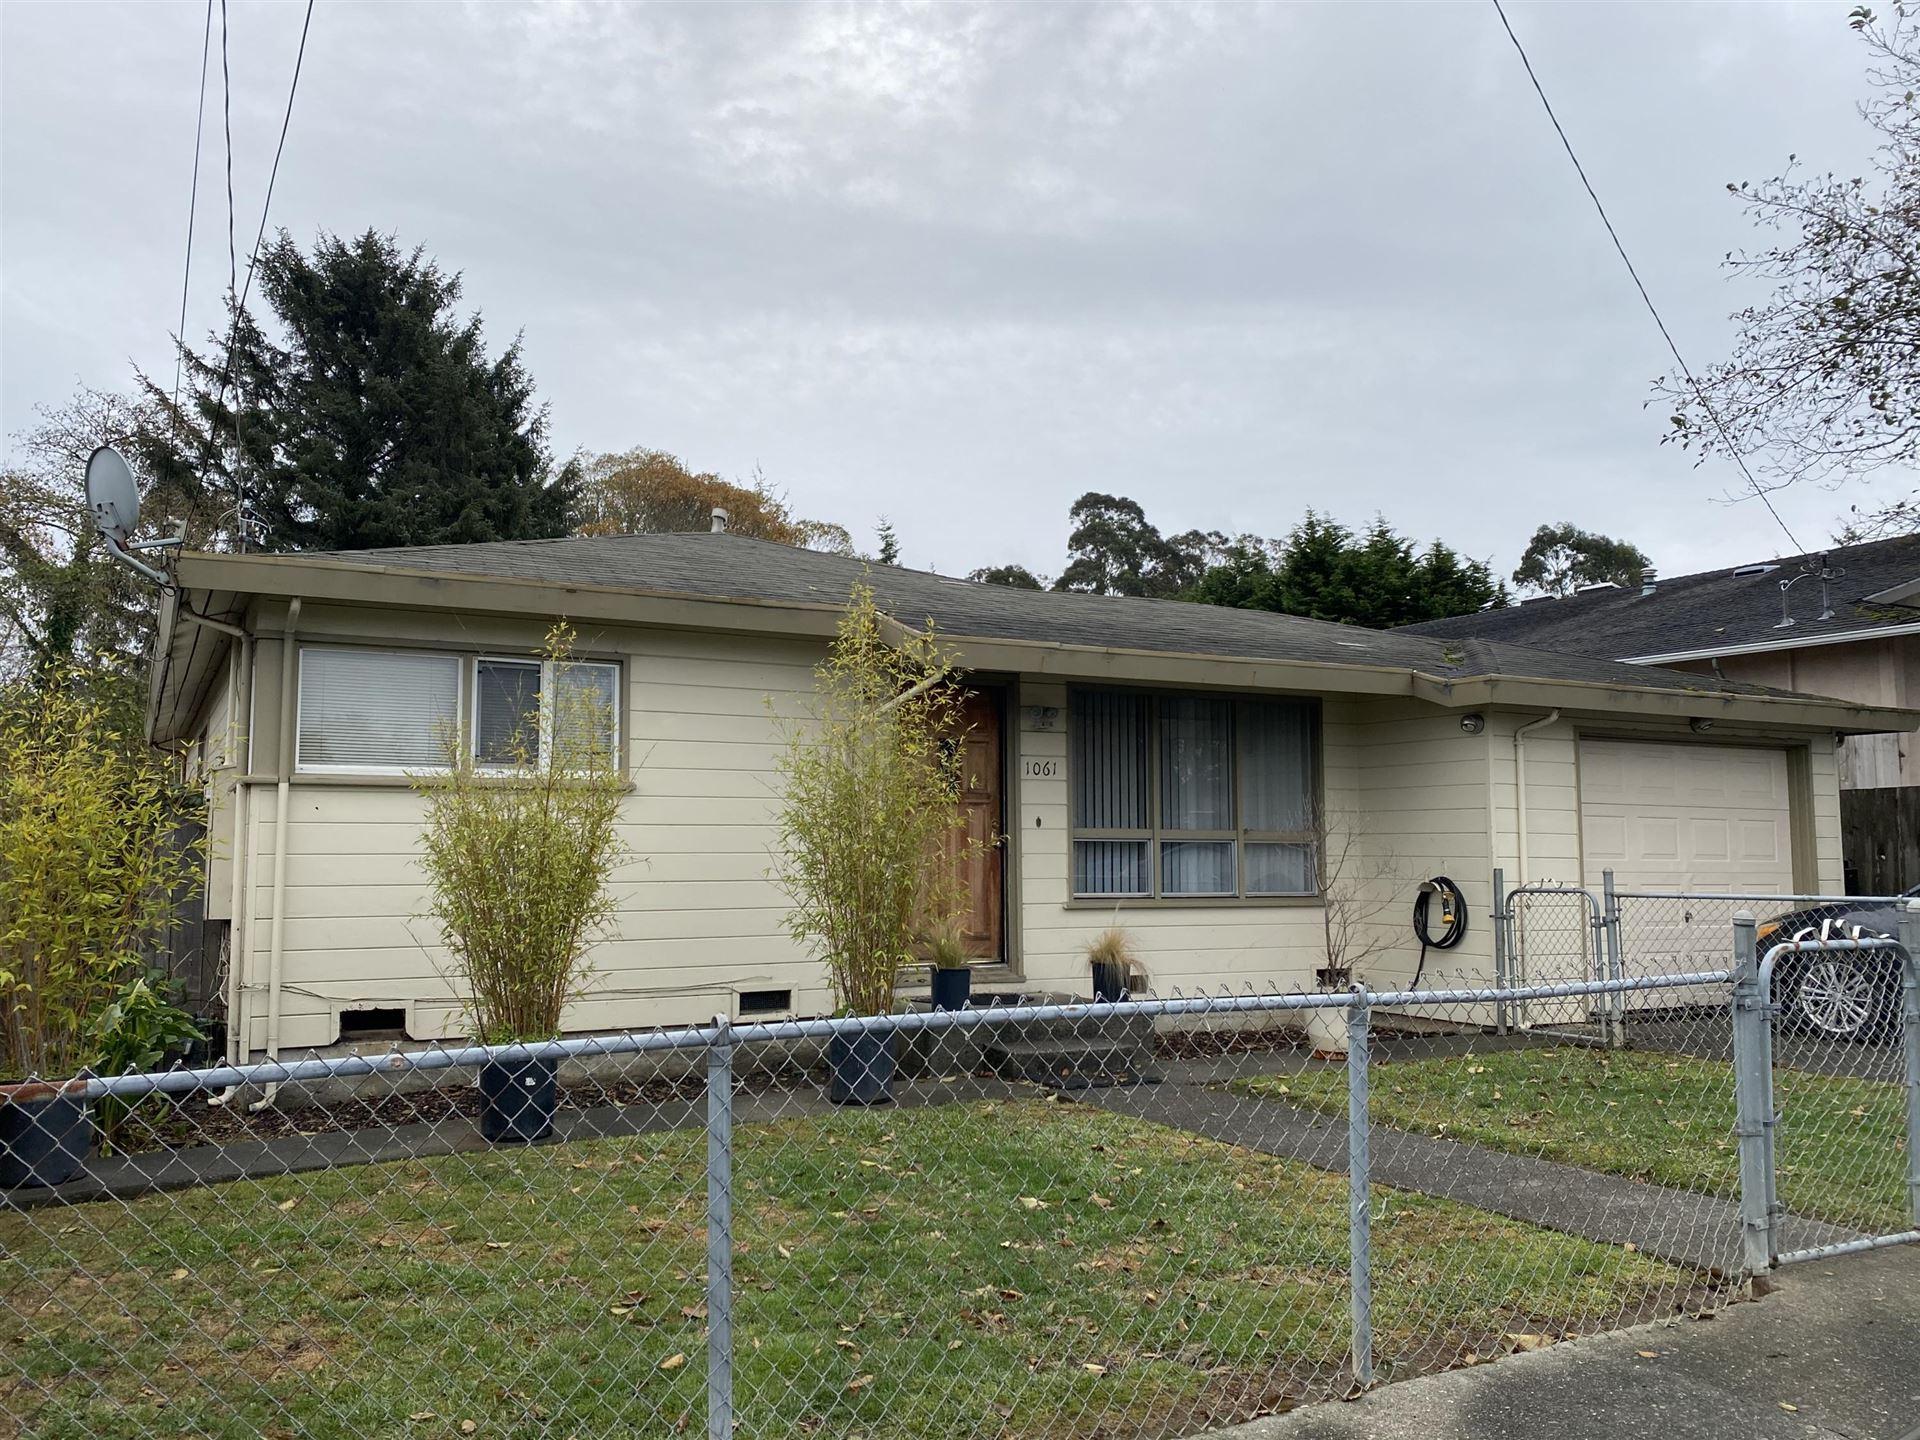 1061 John Hill Road, Myrtletown, CA 95501 - MLS#: 257857